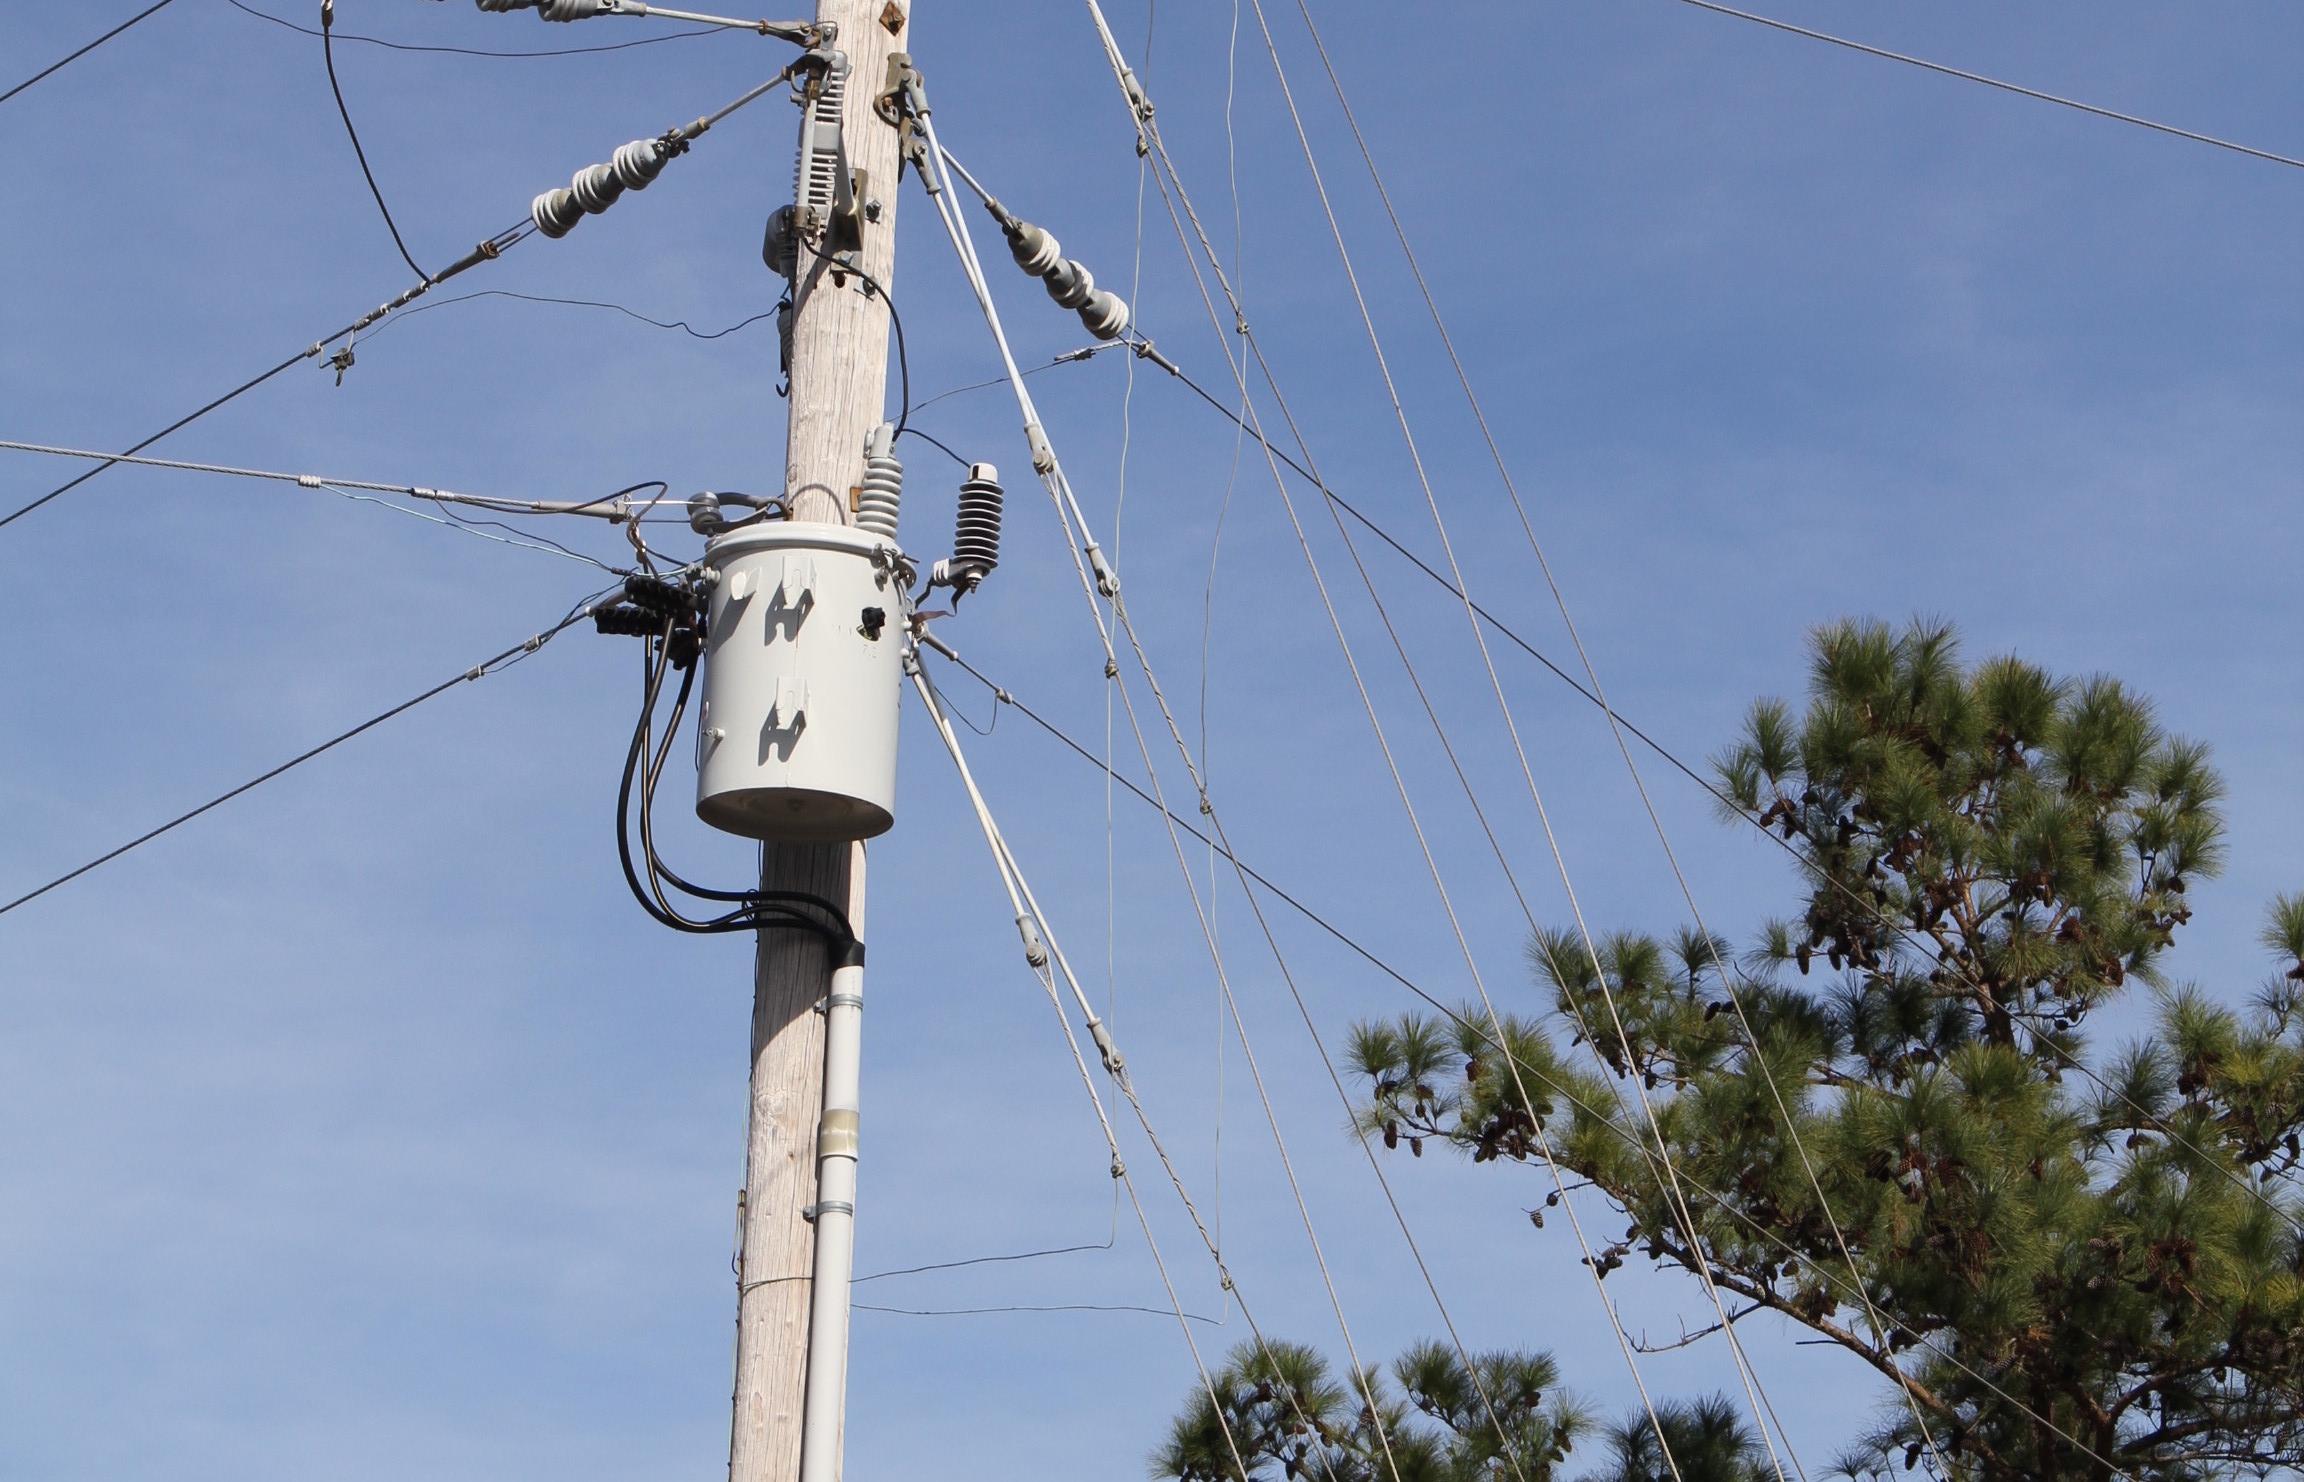 Transformer Electrical power pole - Metglas, Inc